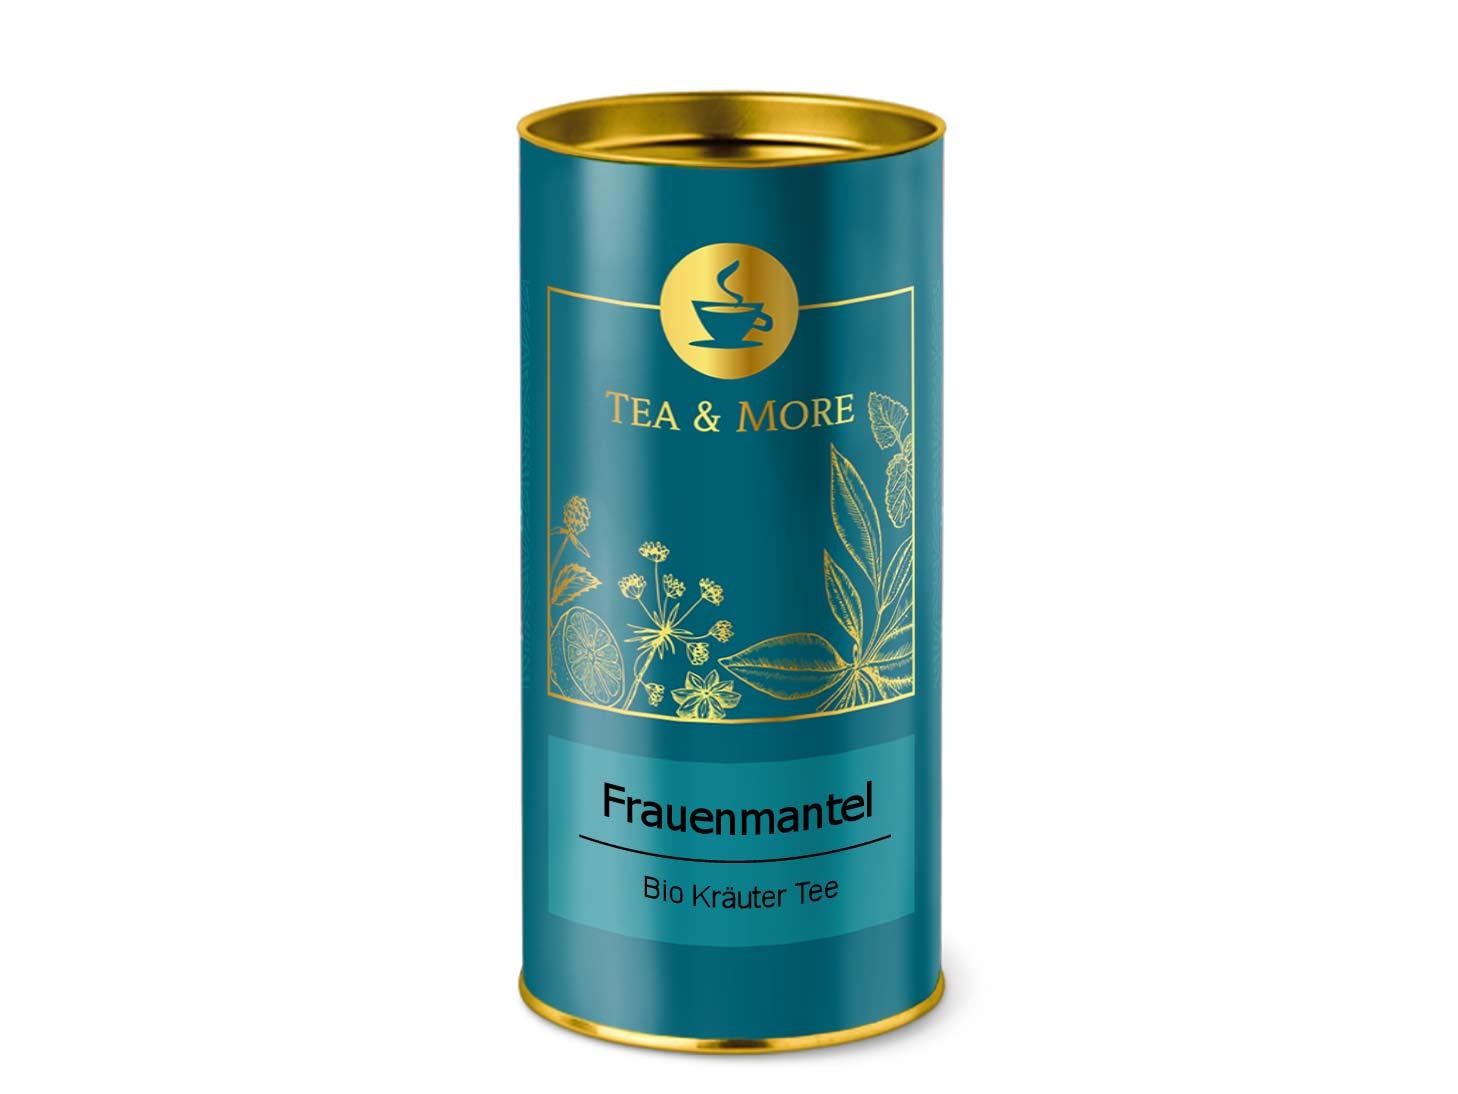 Frauenmantel (Alchemilla vulgaris) (Bio)